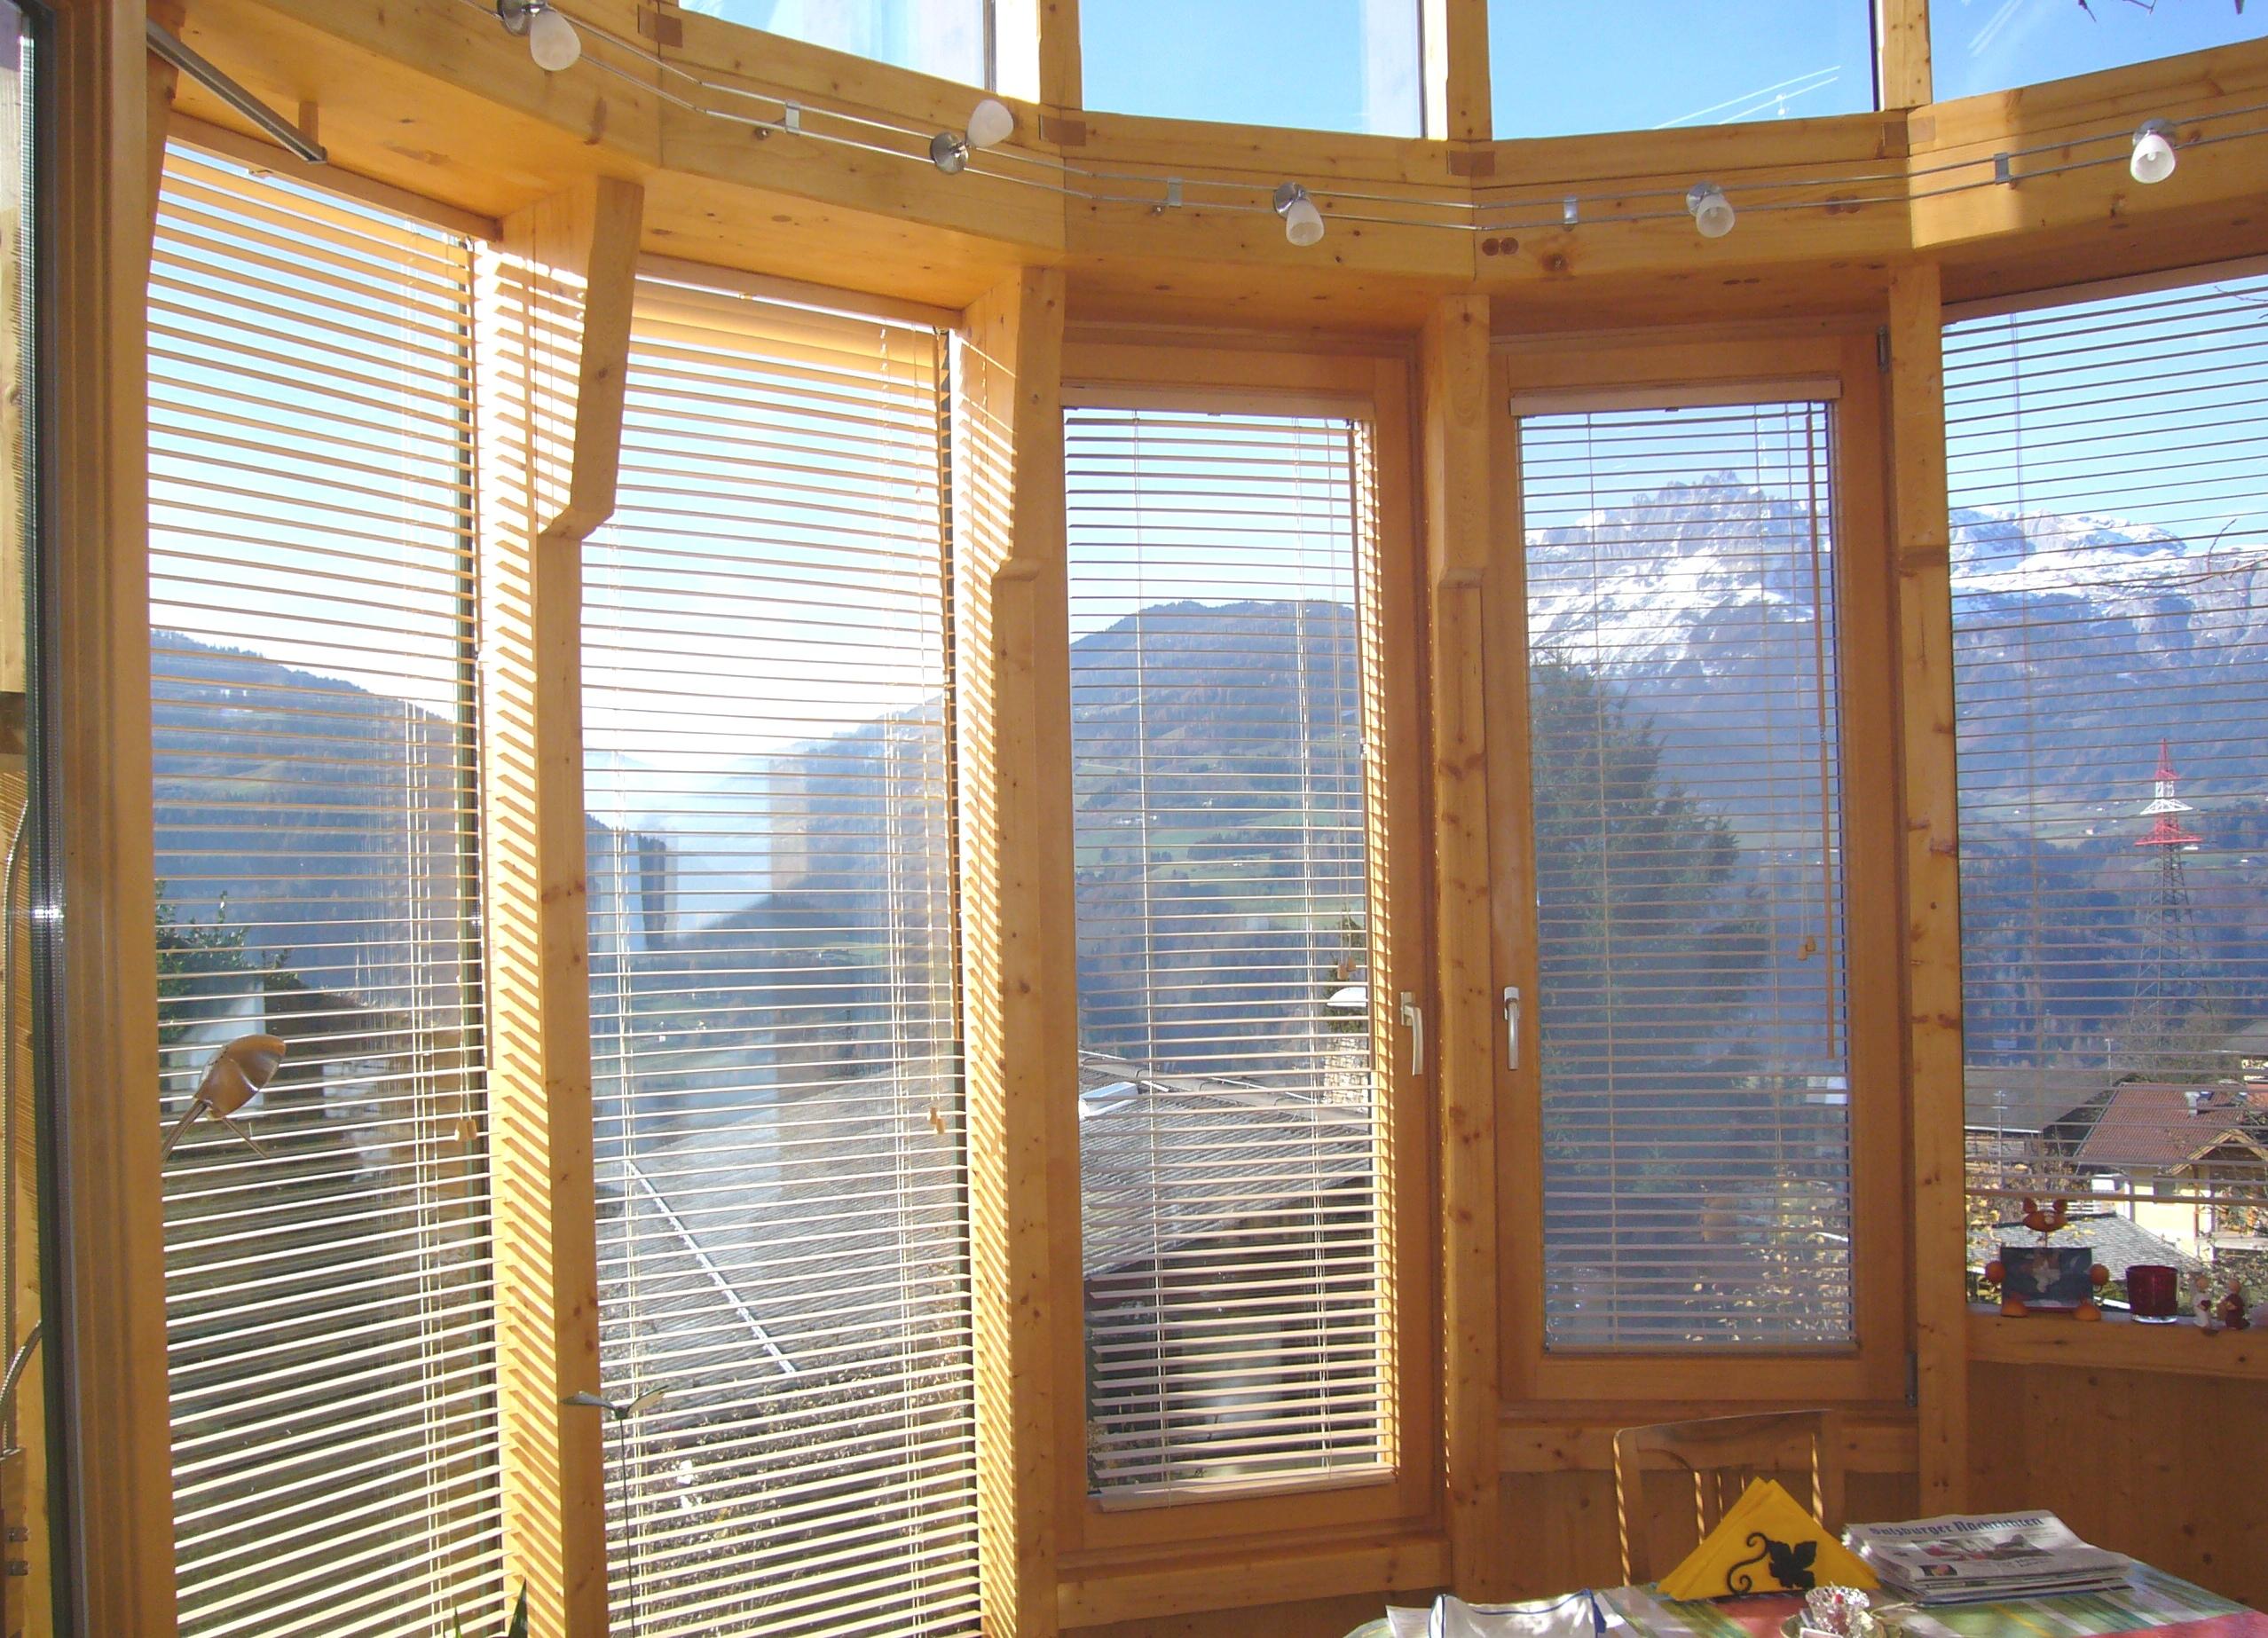 Favorit Wintergärten aus Holz-Alu - Holzbaumeisters´s Blog FE27